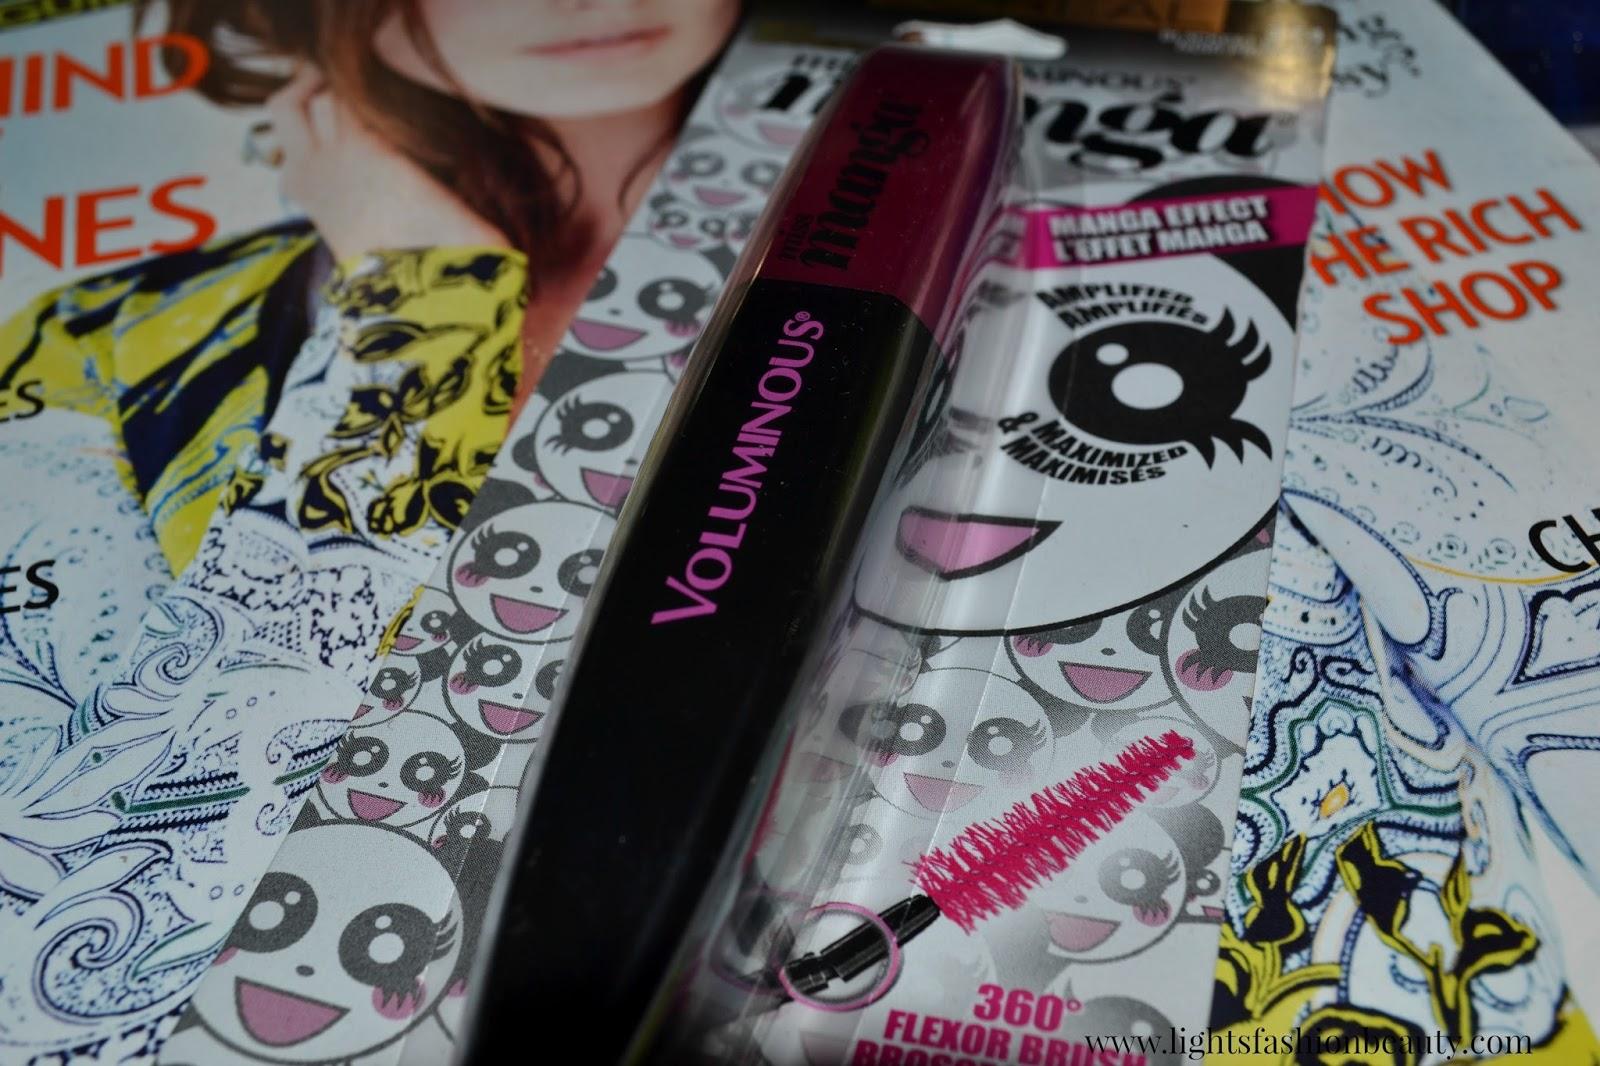 L'Oréal Miss Manga Mascara , miss manga mascara, loreal miss manga, new drugstore mascara, loreal mascara review, miss manga mascara review, beauty, montreal beauty blog, canadian beauty blog, blog beauté montréal, lightsfashionbeauty, canadian blog lightsfashionbeauty, brown beauty,